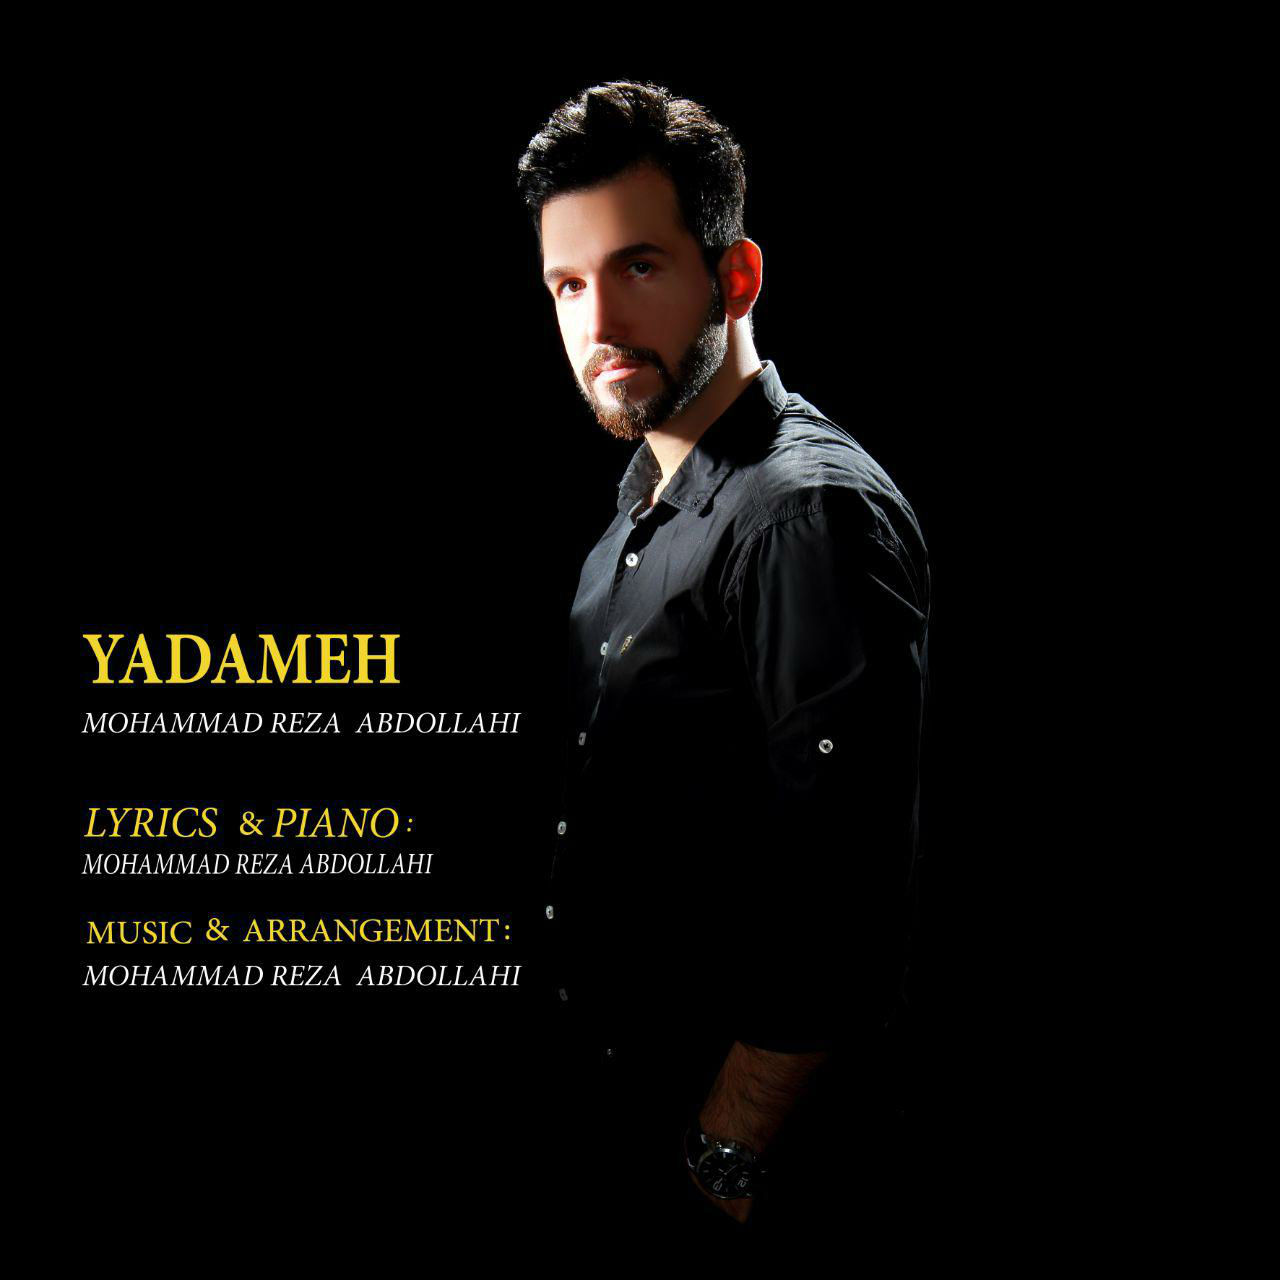 Mohammad Reza Abdollahi – Yadameh